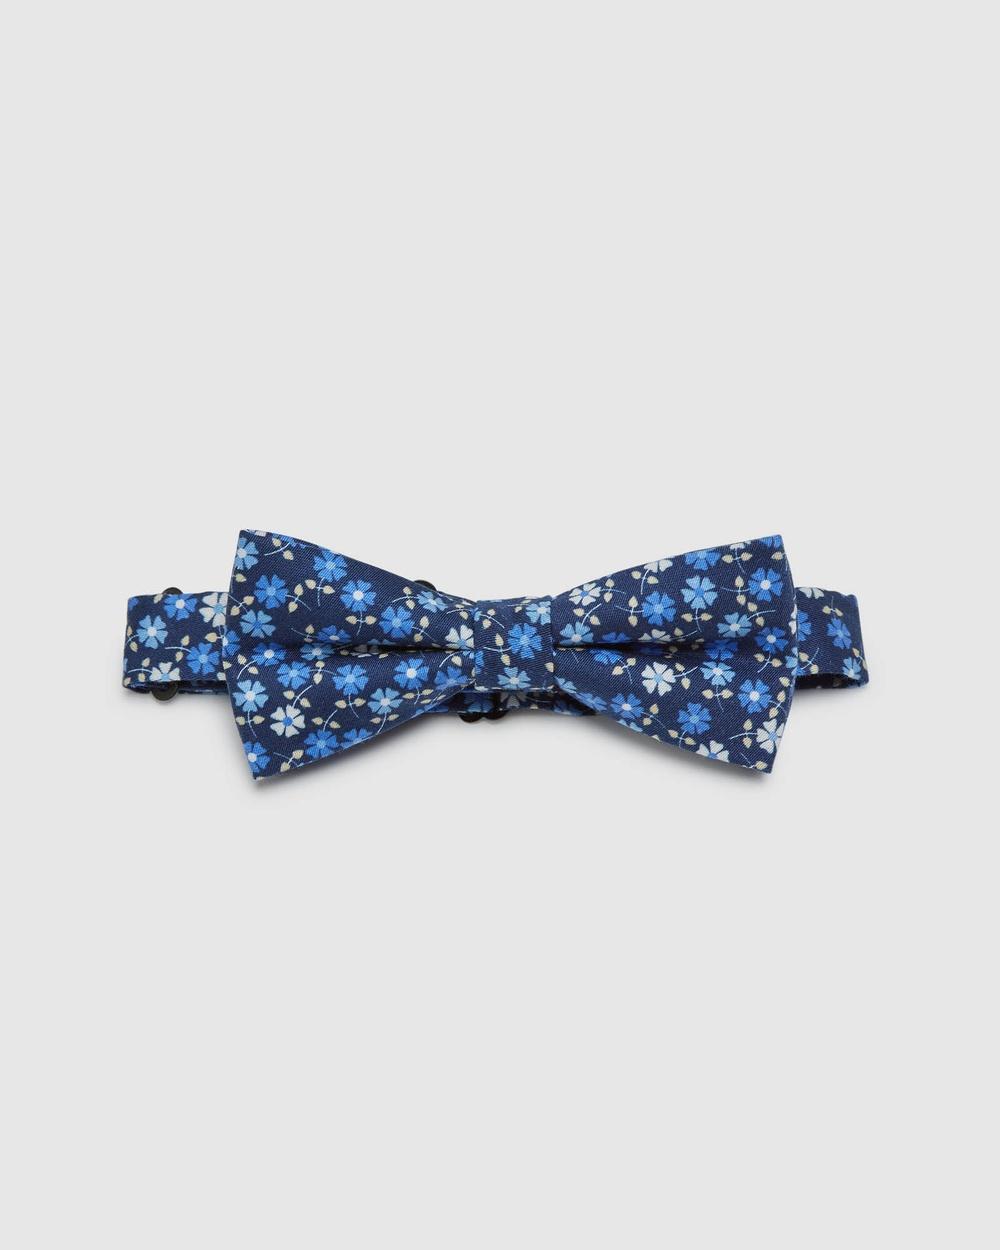 Oxford Cotton Ditzy Floral Bow Tie Ties Blue Ties Australia